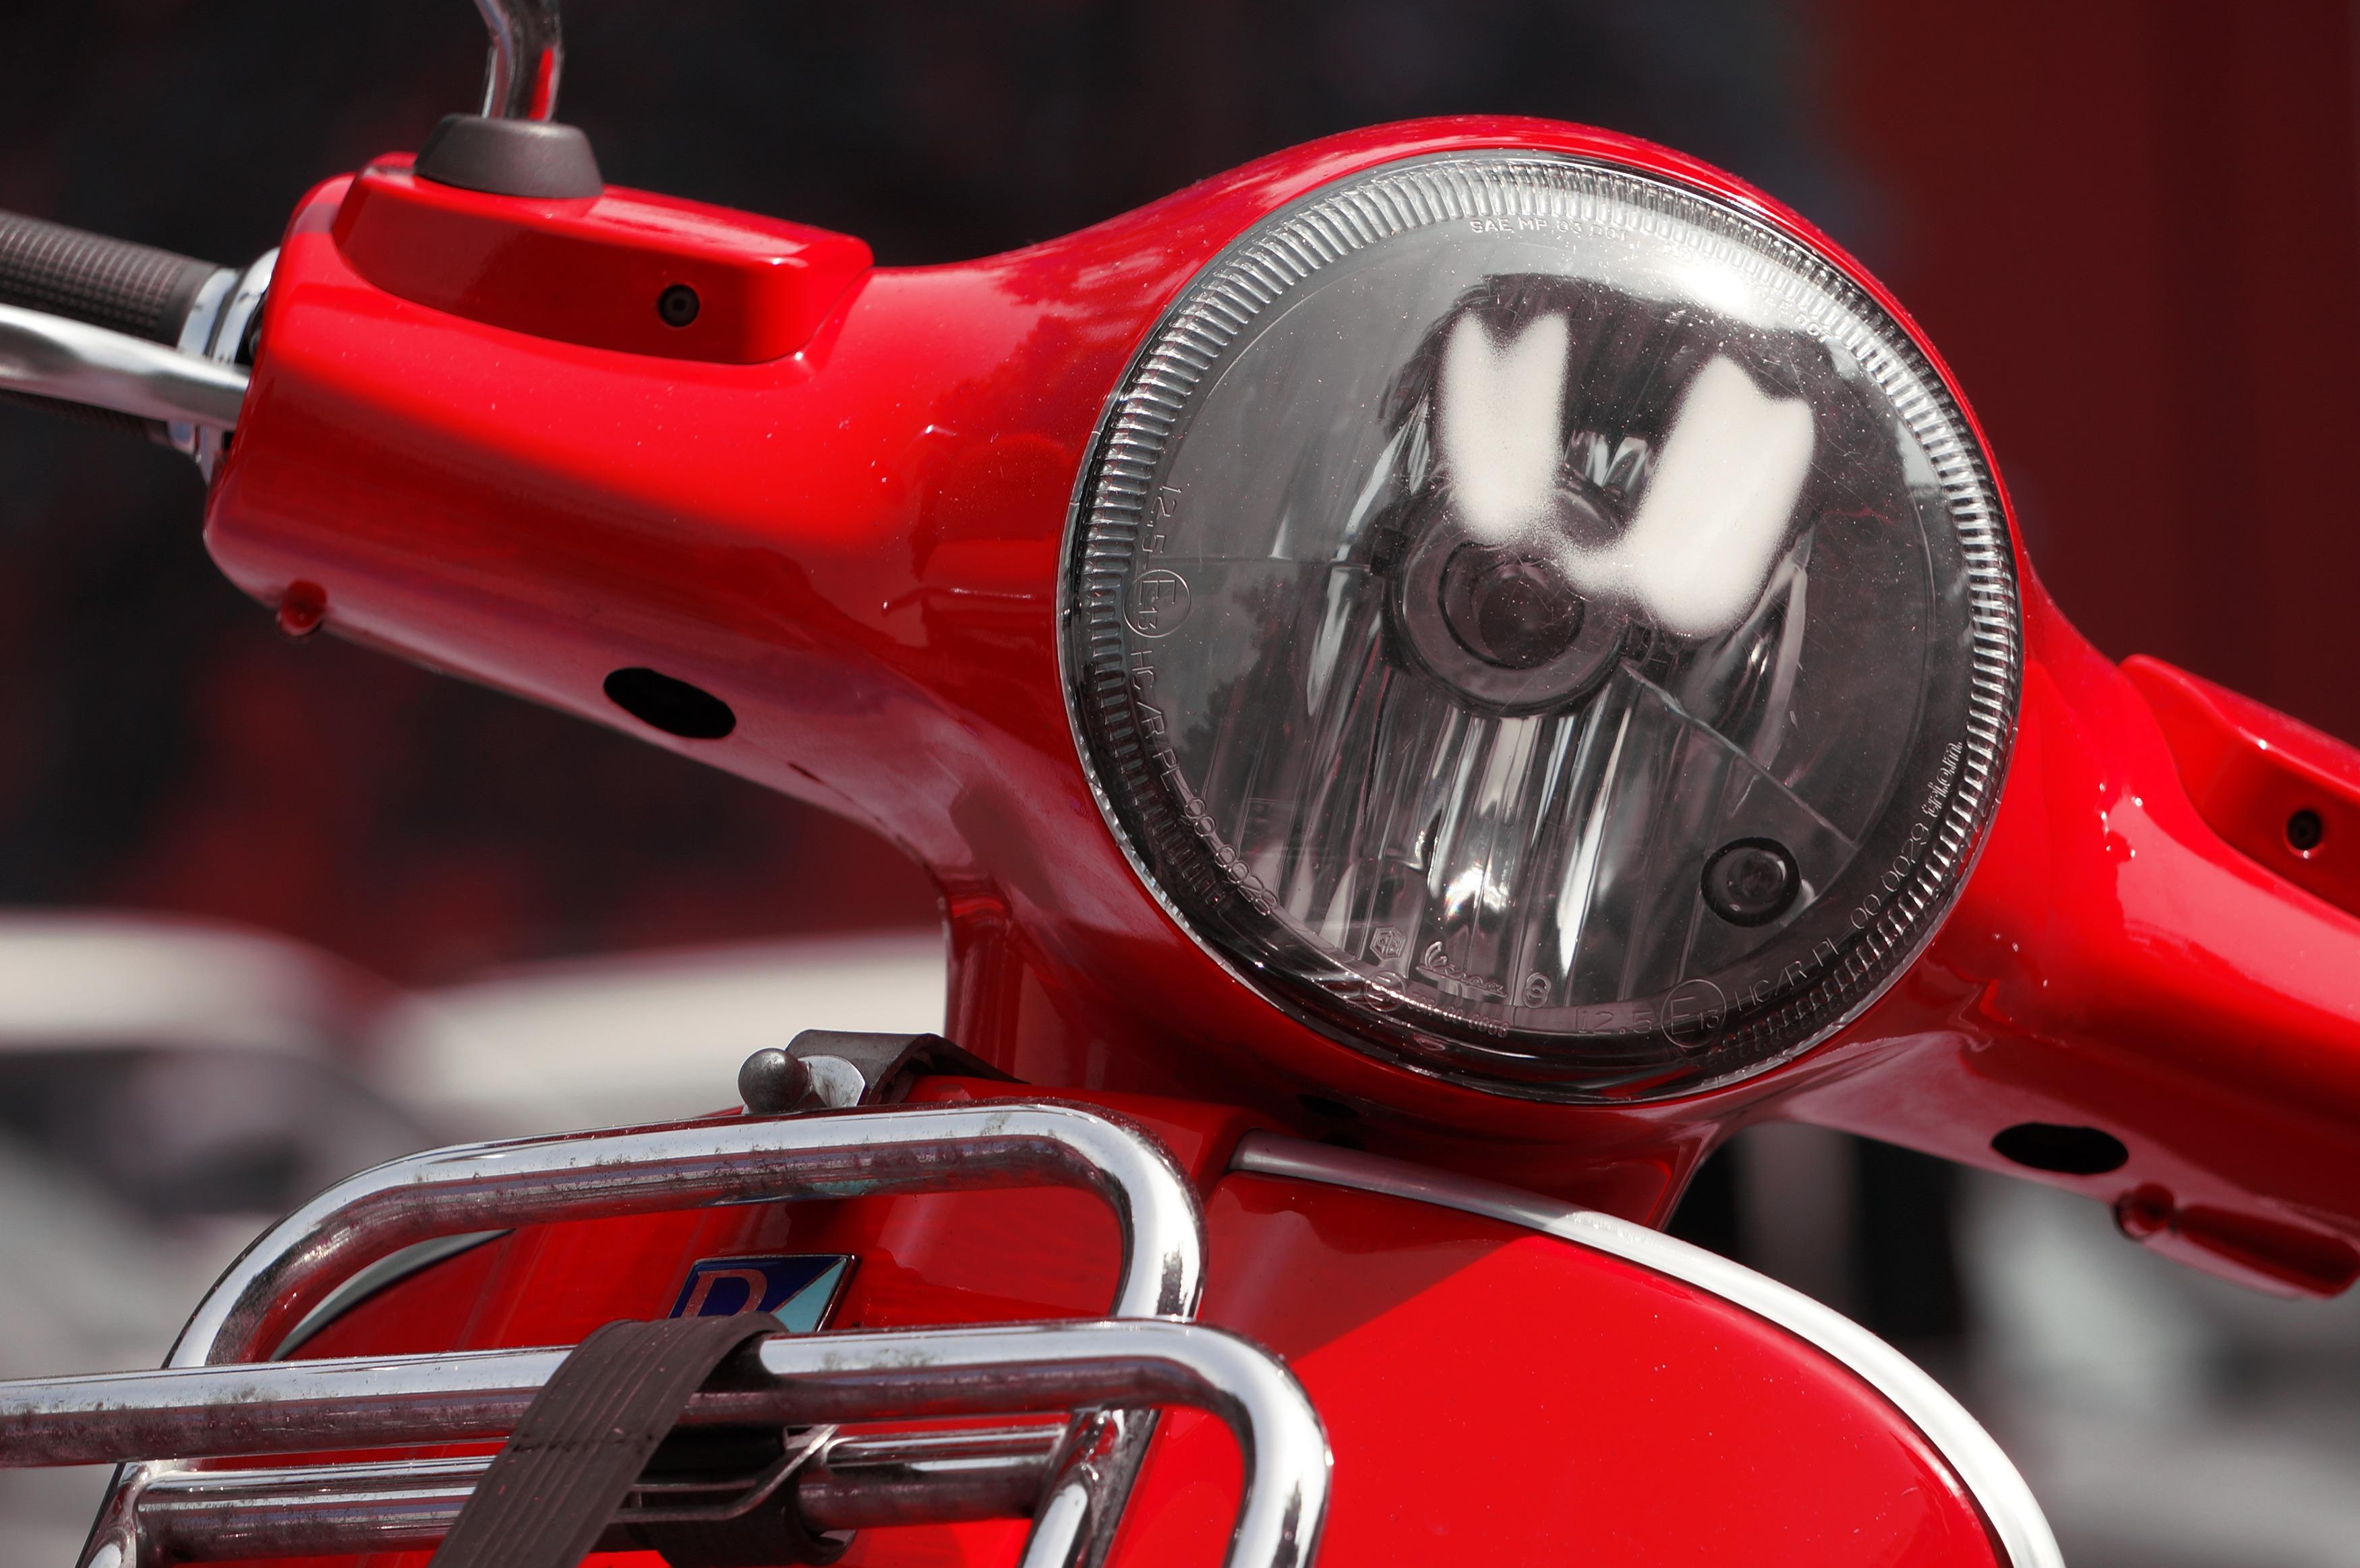 Motor Scooter Headlight